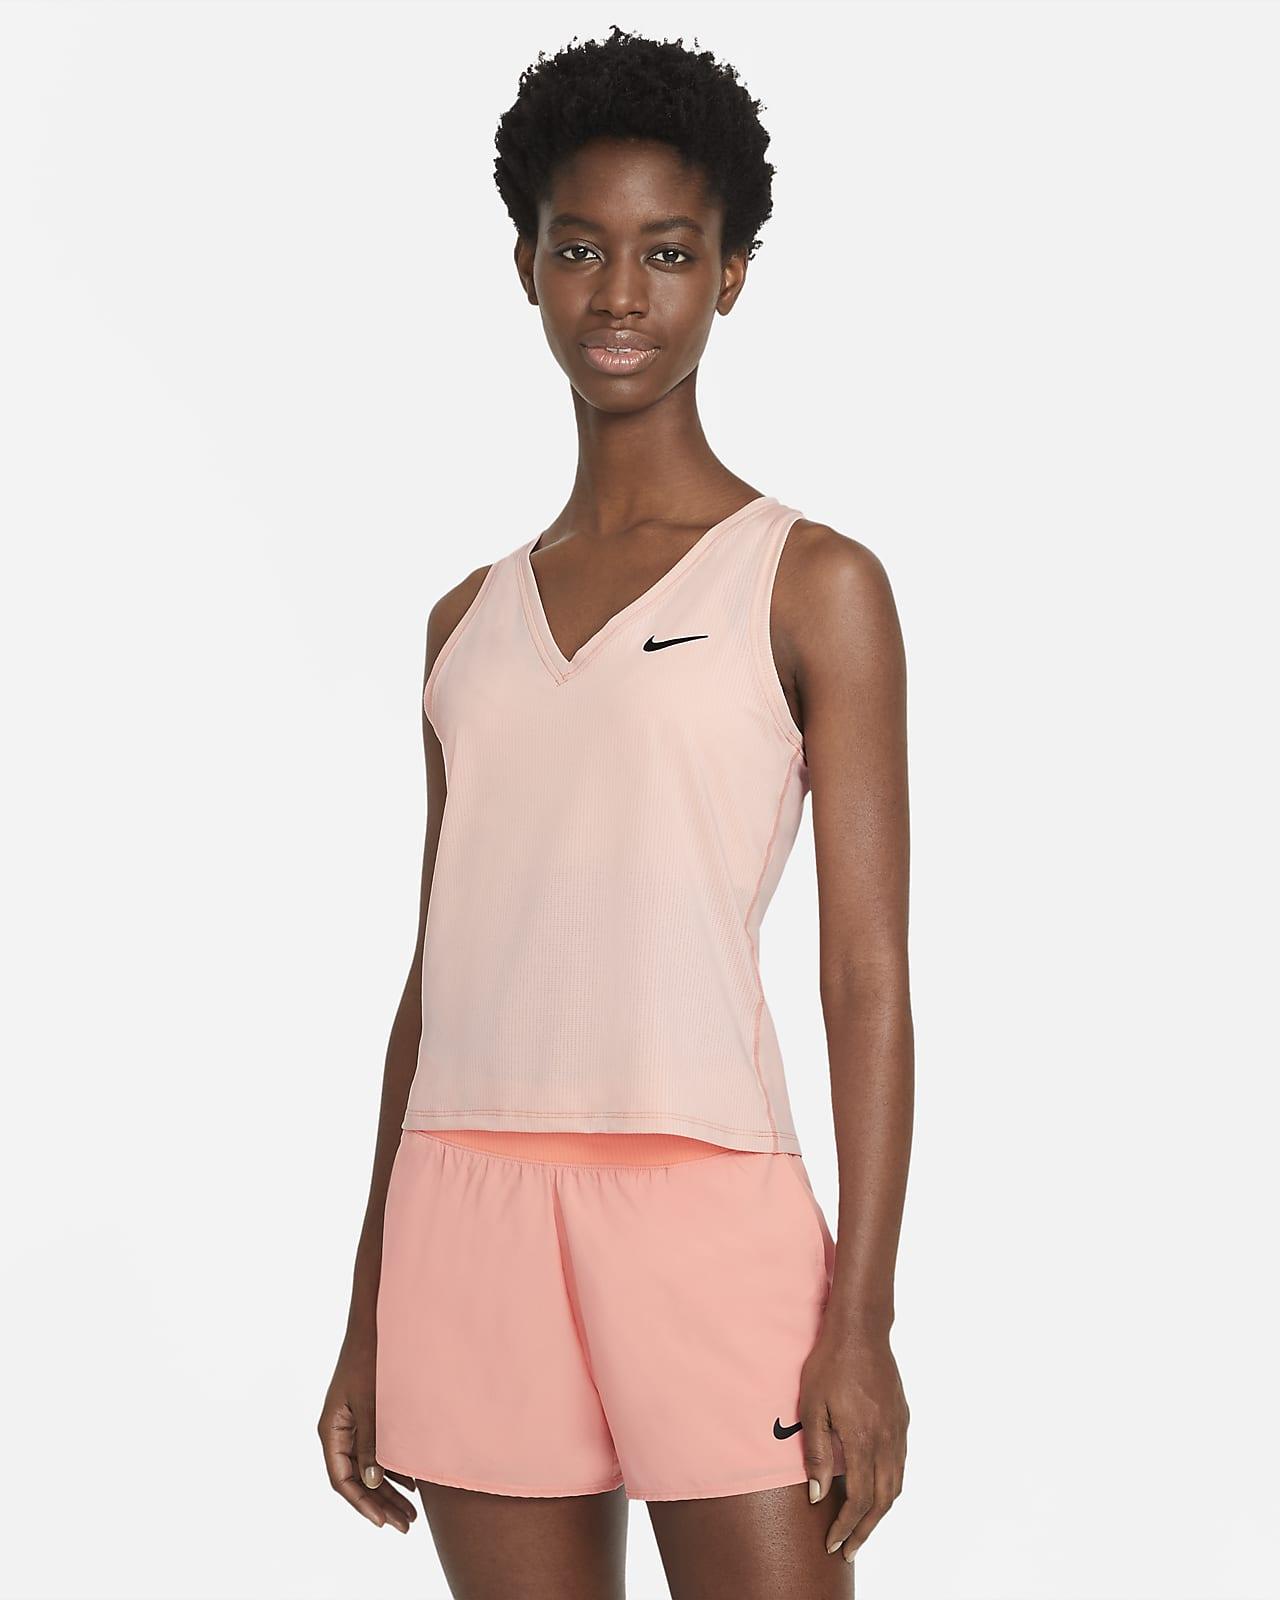 Camiseta de tirantes de tenis para mujer NikeCourt Victory